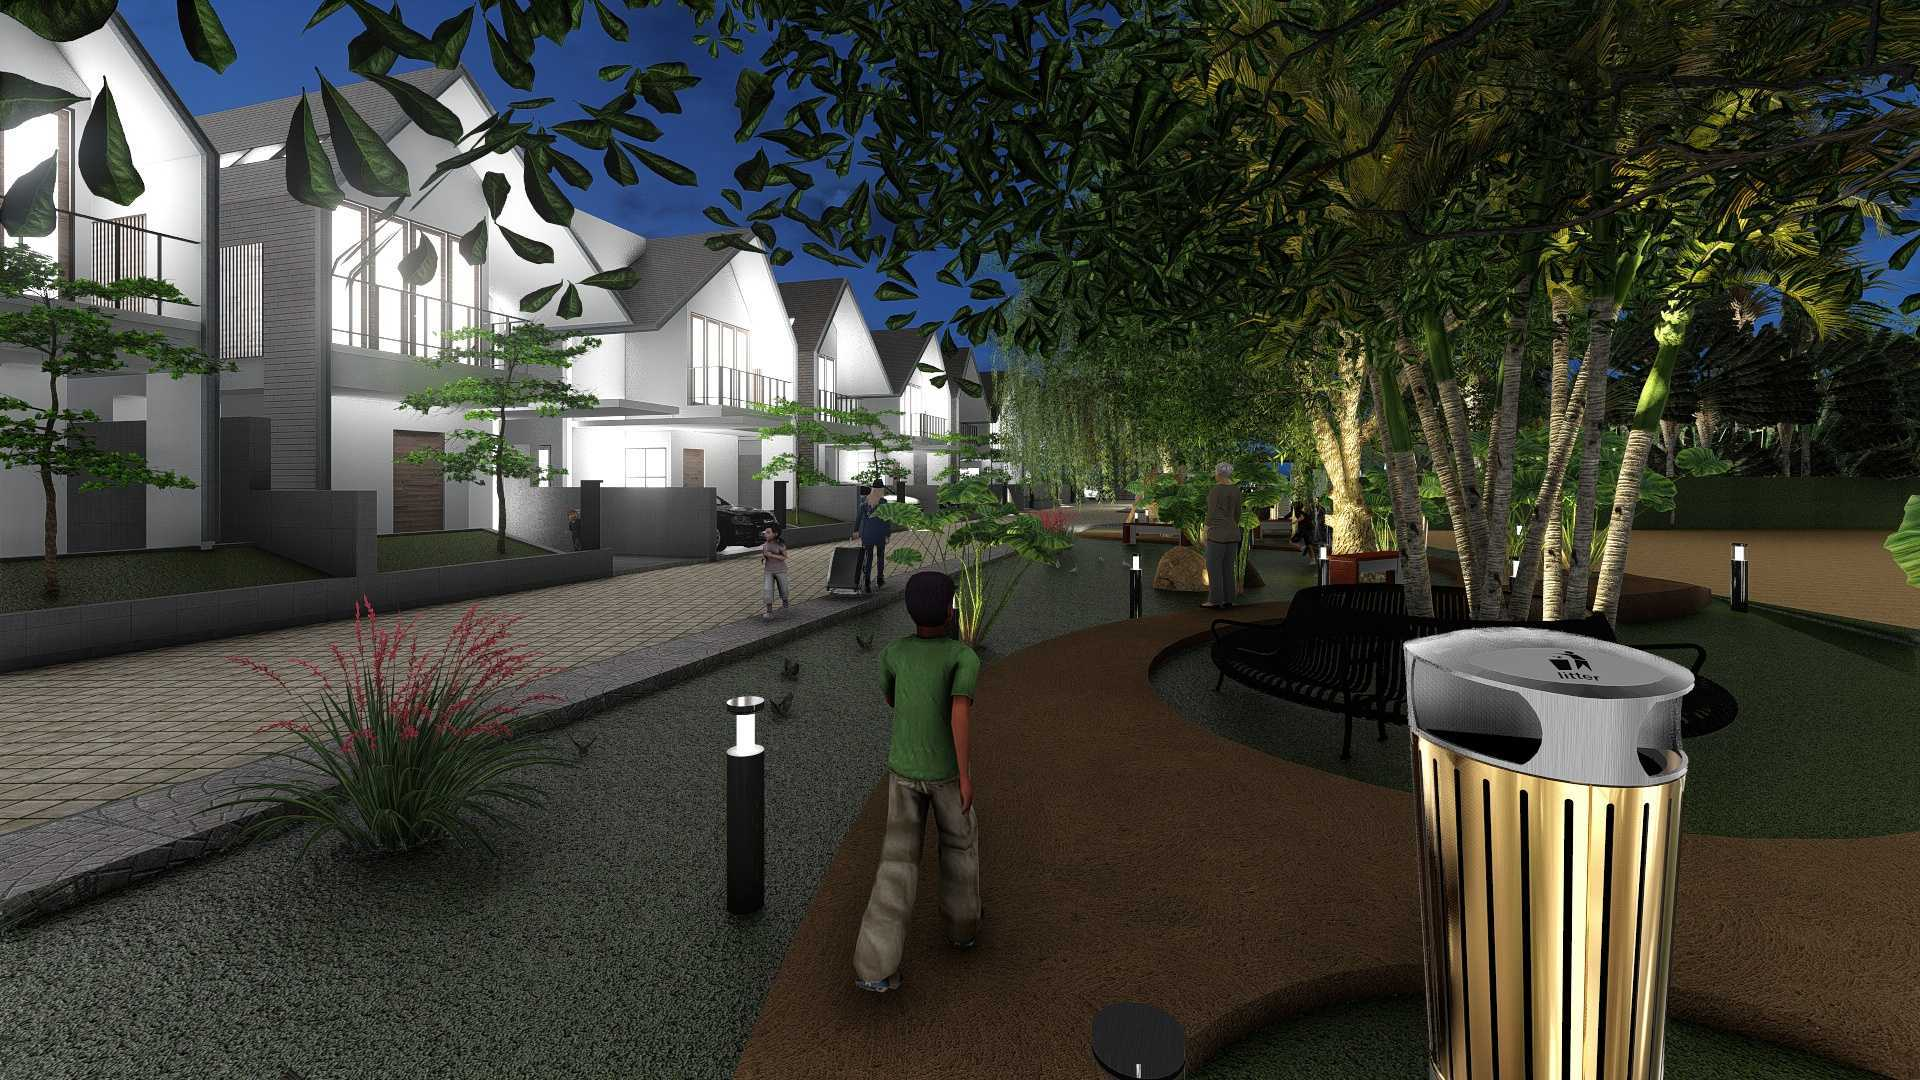 Samitrayasa Design Limo Housing Limo, Kota Depok, Jawa Barat, Indonesia Limo, Kota Depok, Jawa Barat, Indonesia 112 Tropis  32604